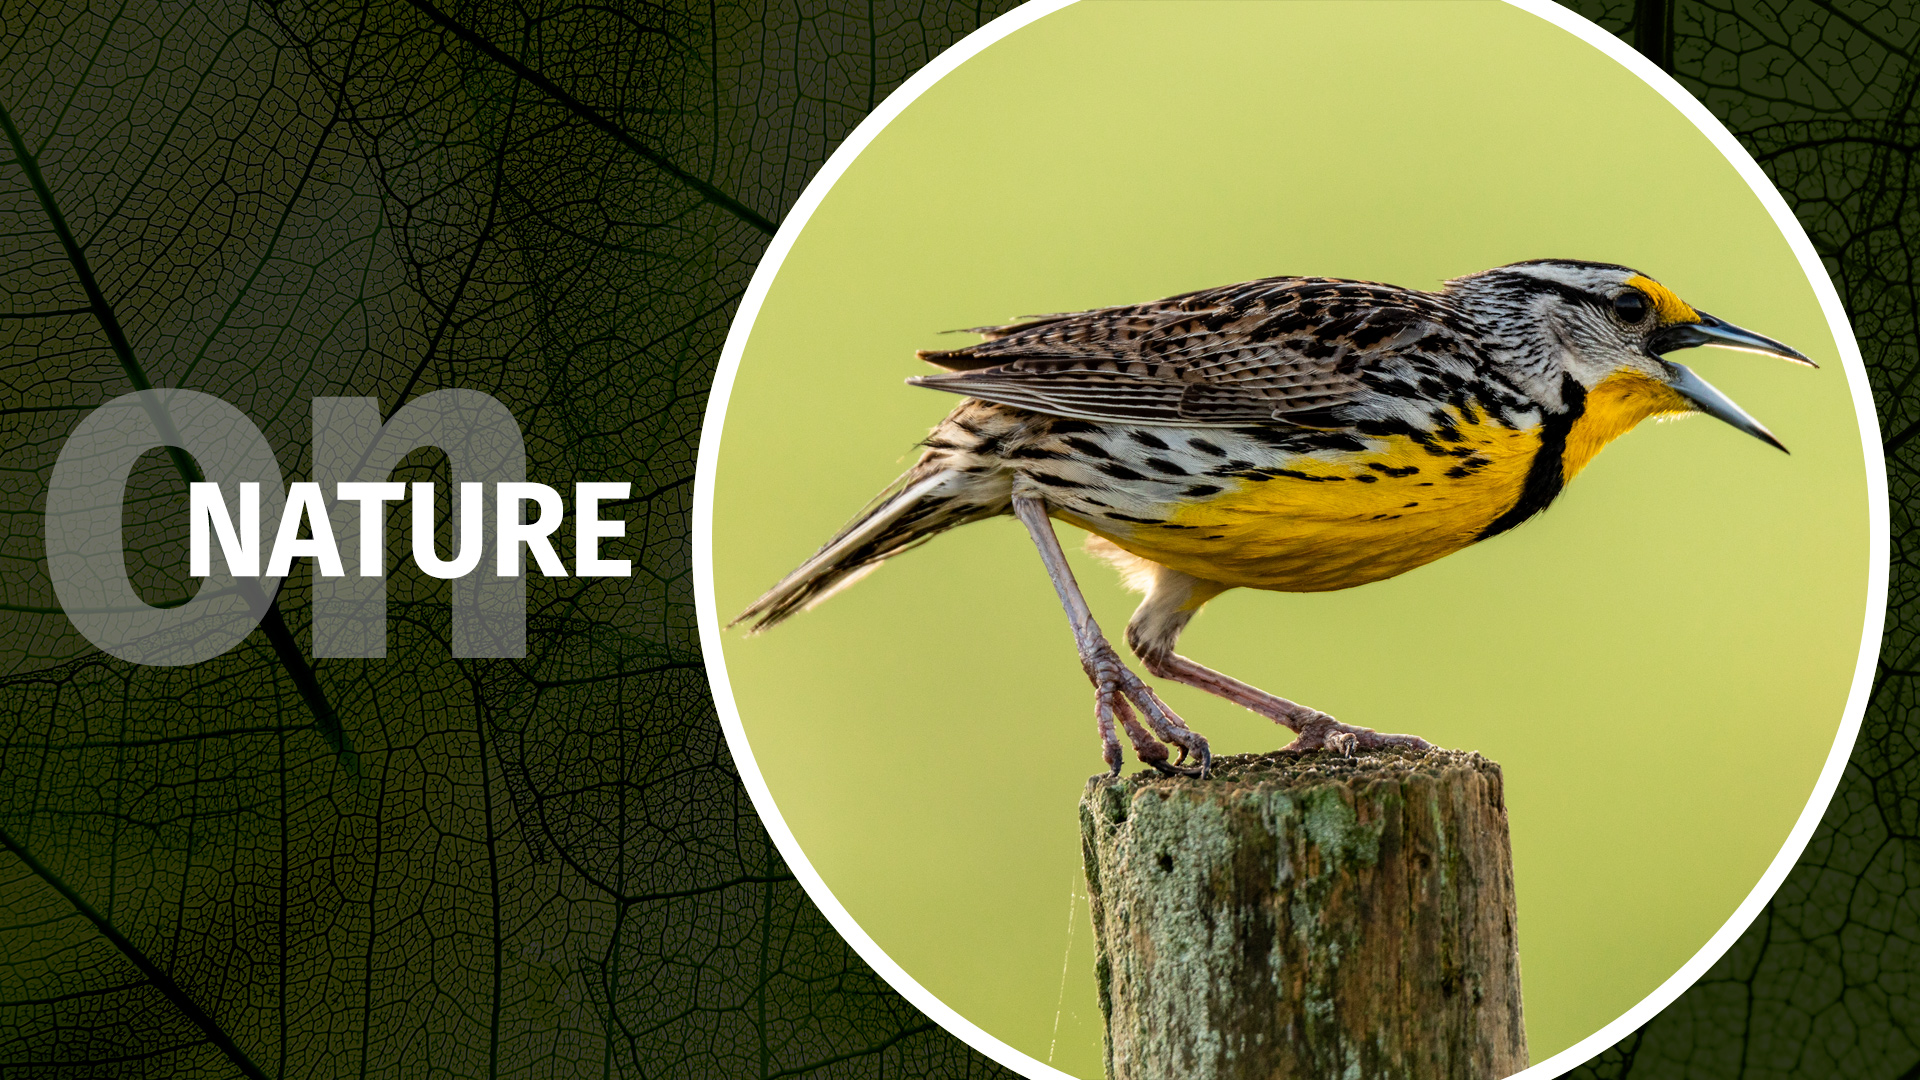 The On Nature column by Jason Hahn on Photofocus